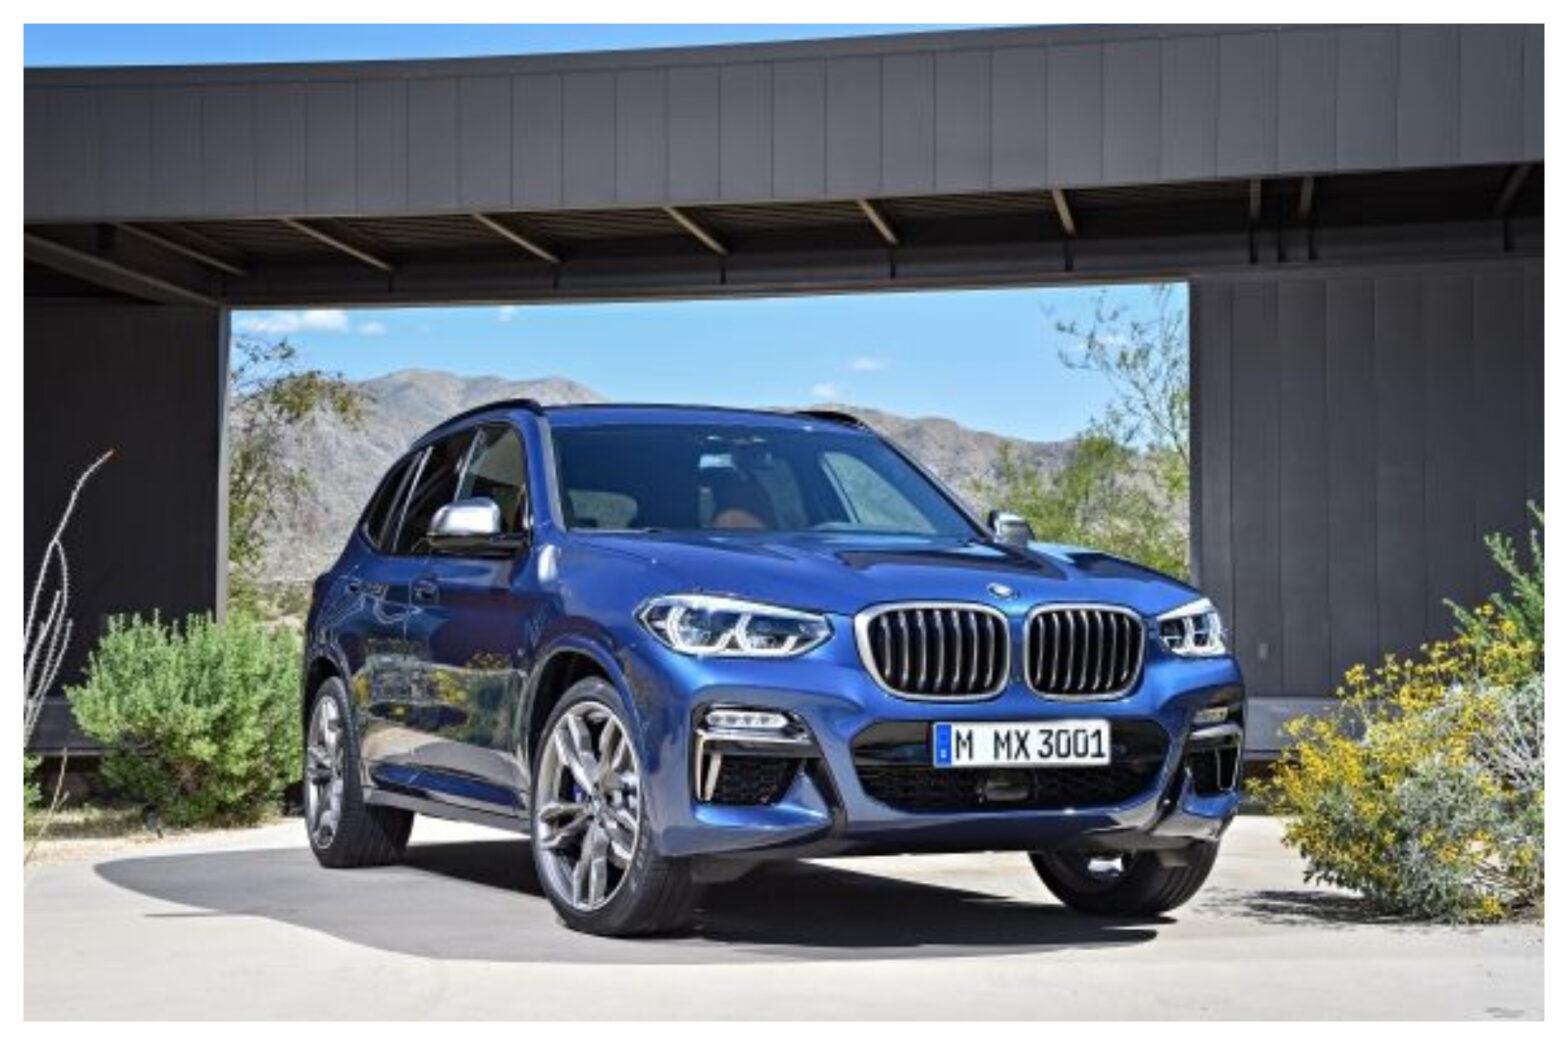 【BMWのSUV】新車11車種一覧比較&口コミ評価 2020年最新版